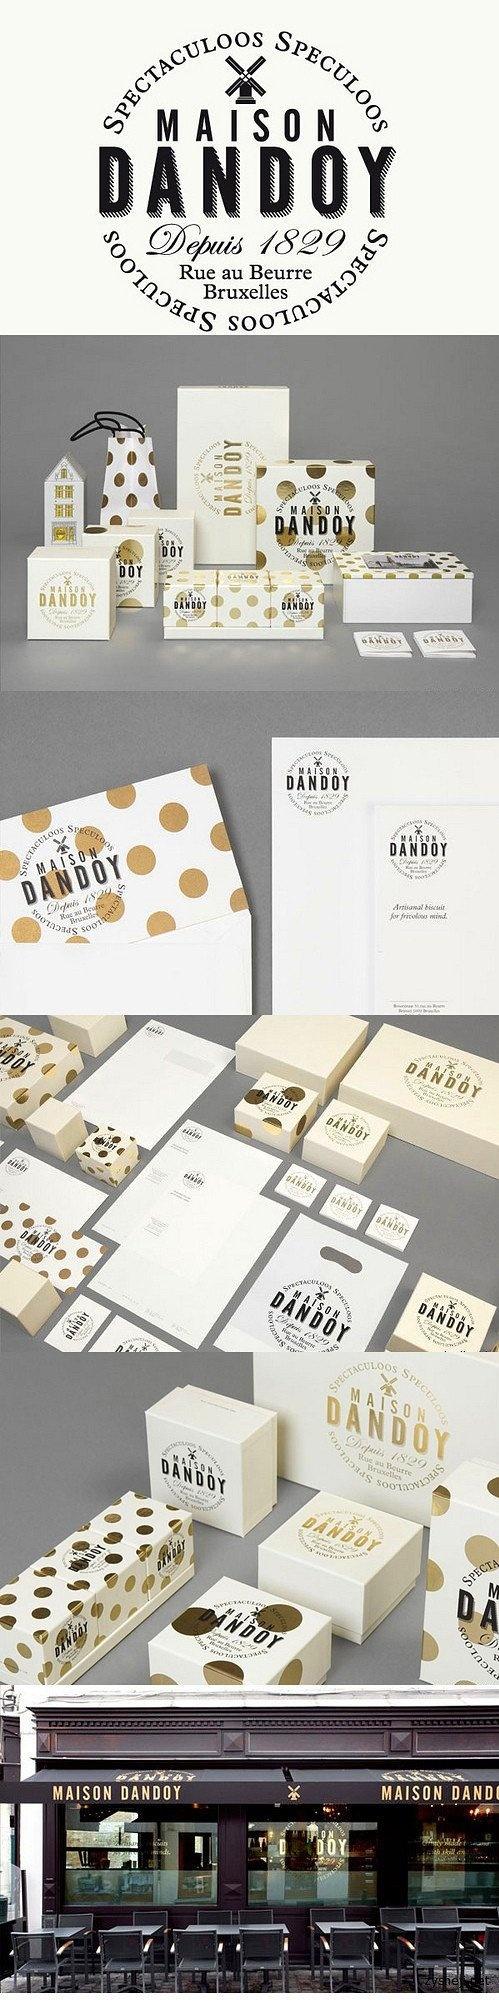 Maison Dandoy I'm seeing spots #identity #packaging #branding. PD